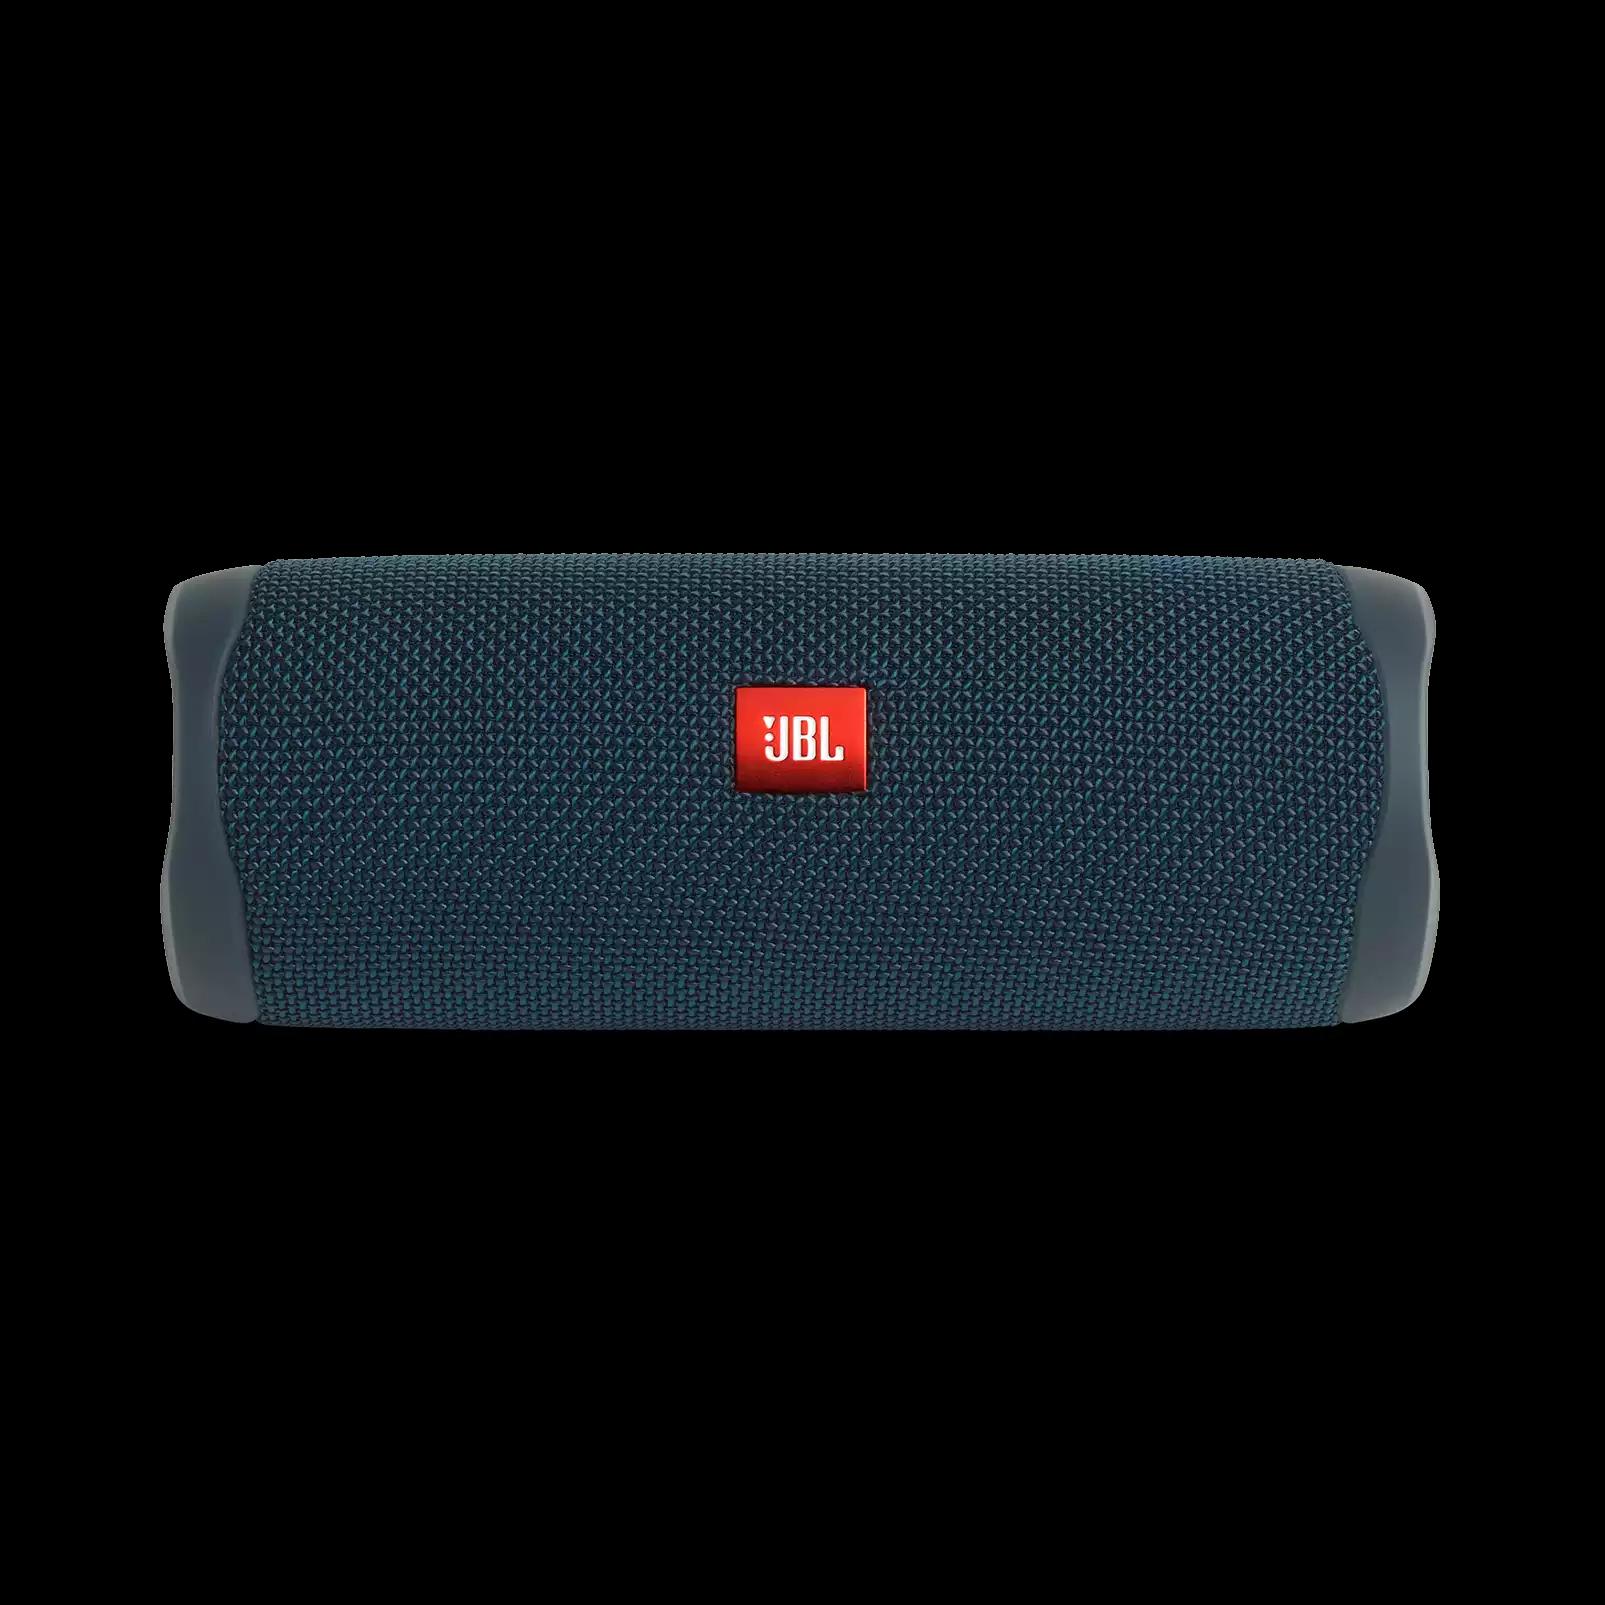 JBL FLIP 5 | Portable Waterproof Speaker